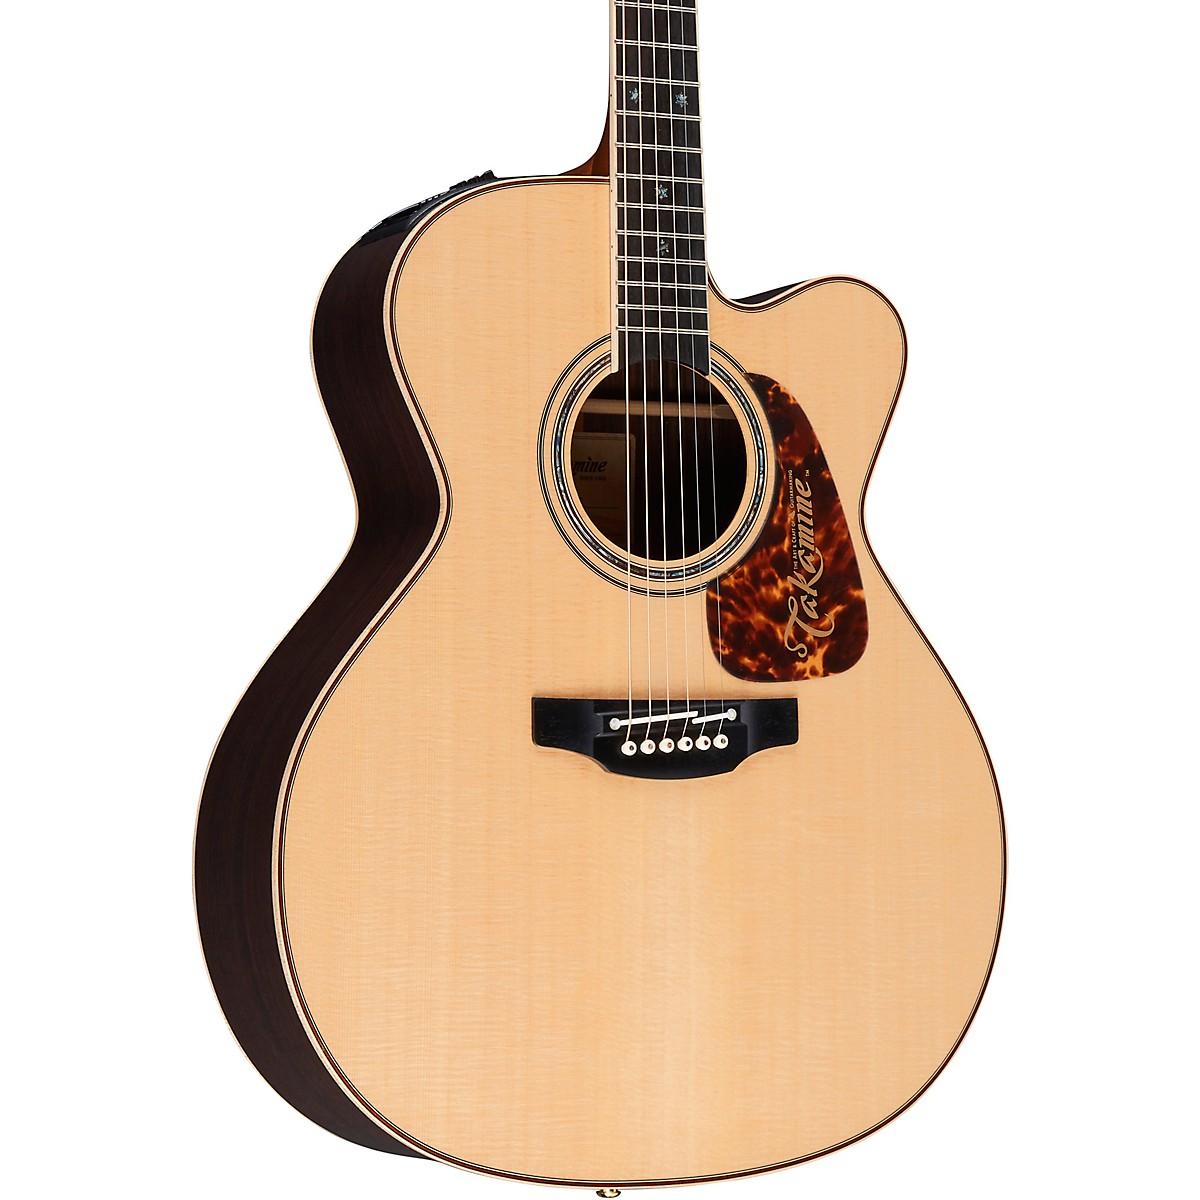 Takamine Pro Series 7 Jumbo Cutaway Acoustic-Electric Guitar